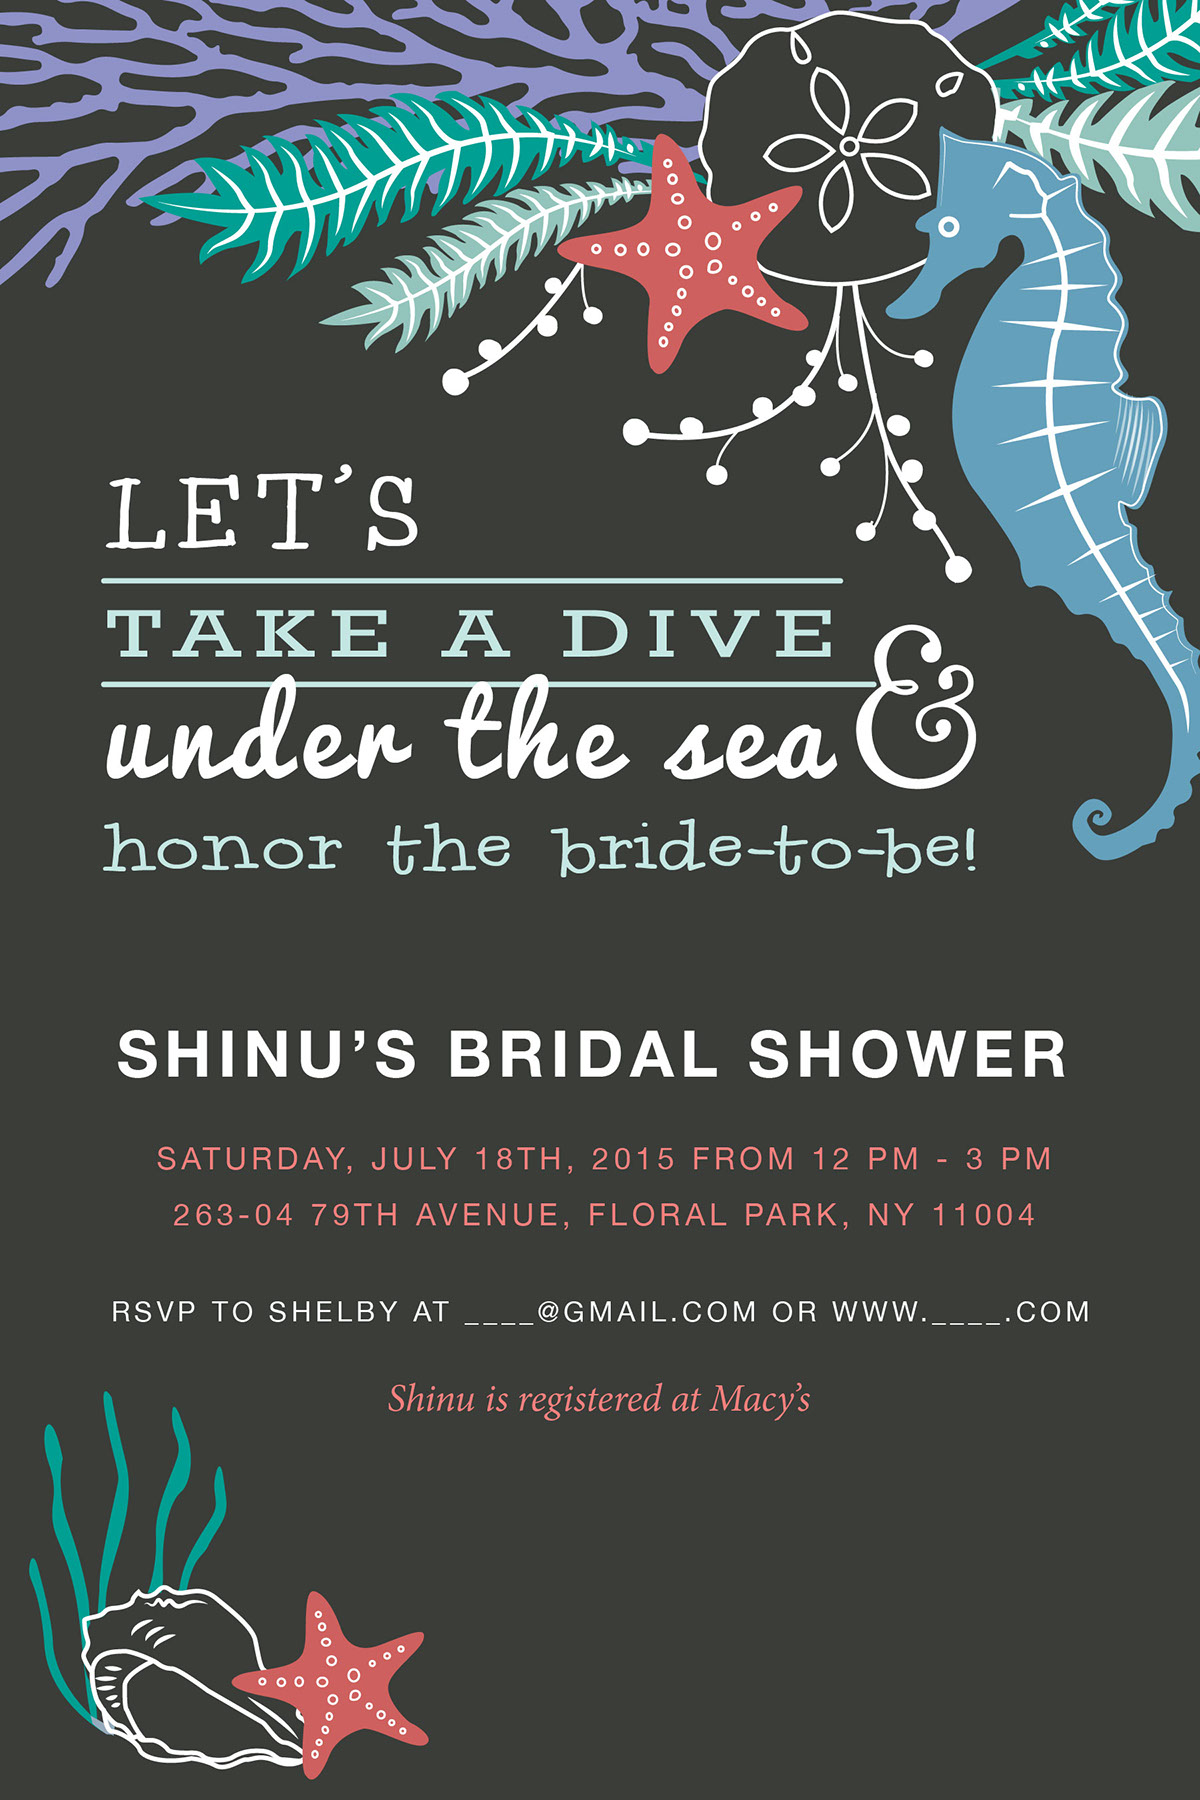 Playful sea themed bridal shower invitation on behance playful sea themed bridal shower invitation on behance filmwisefo